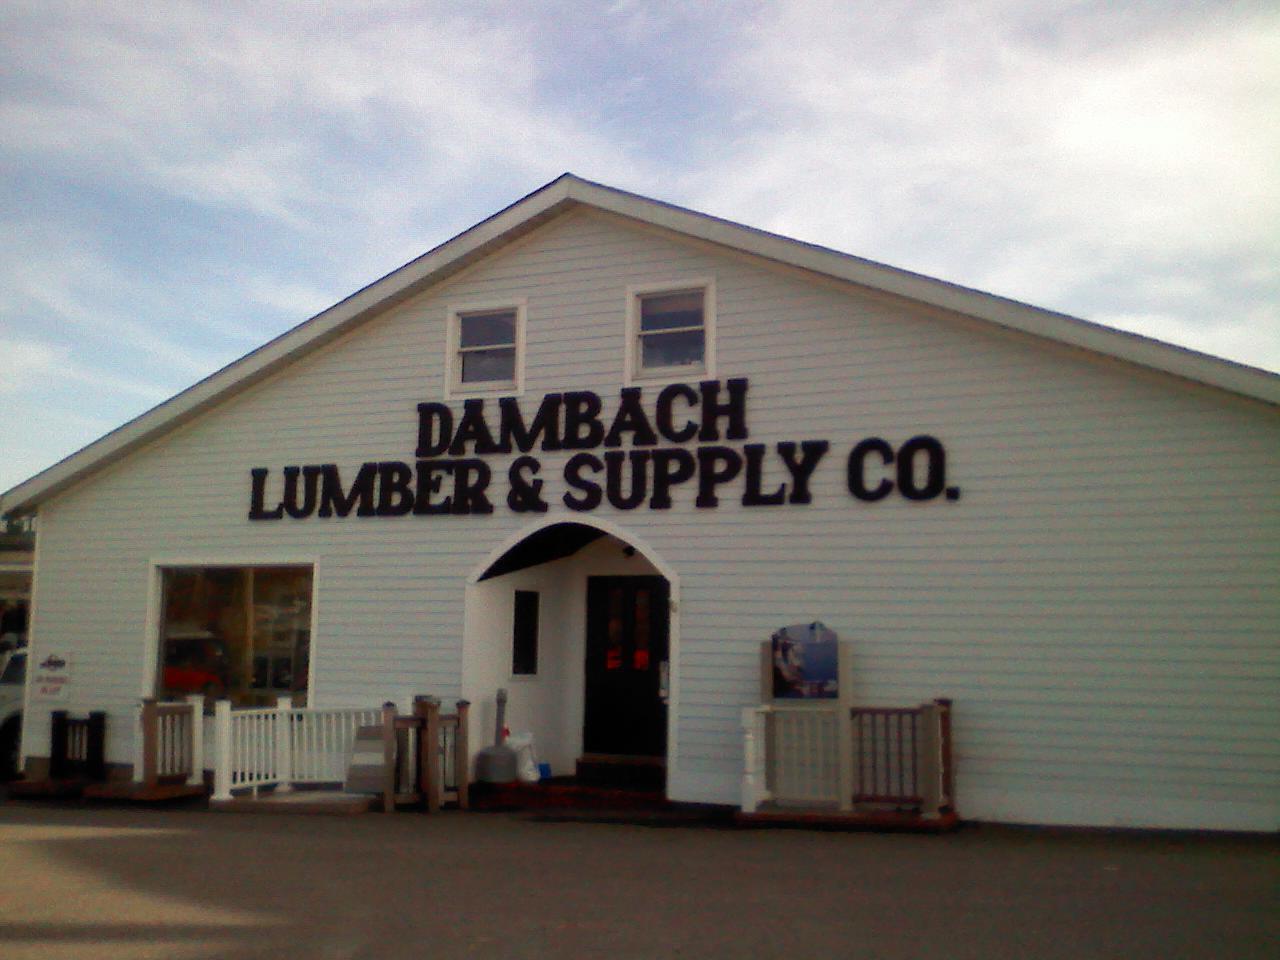 Dambach Lumber & Supply Co.